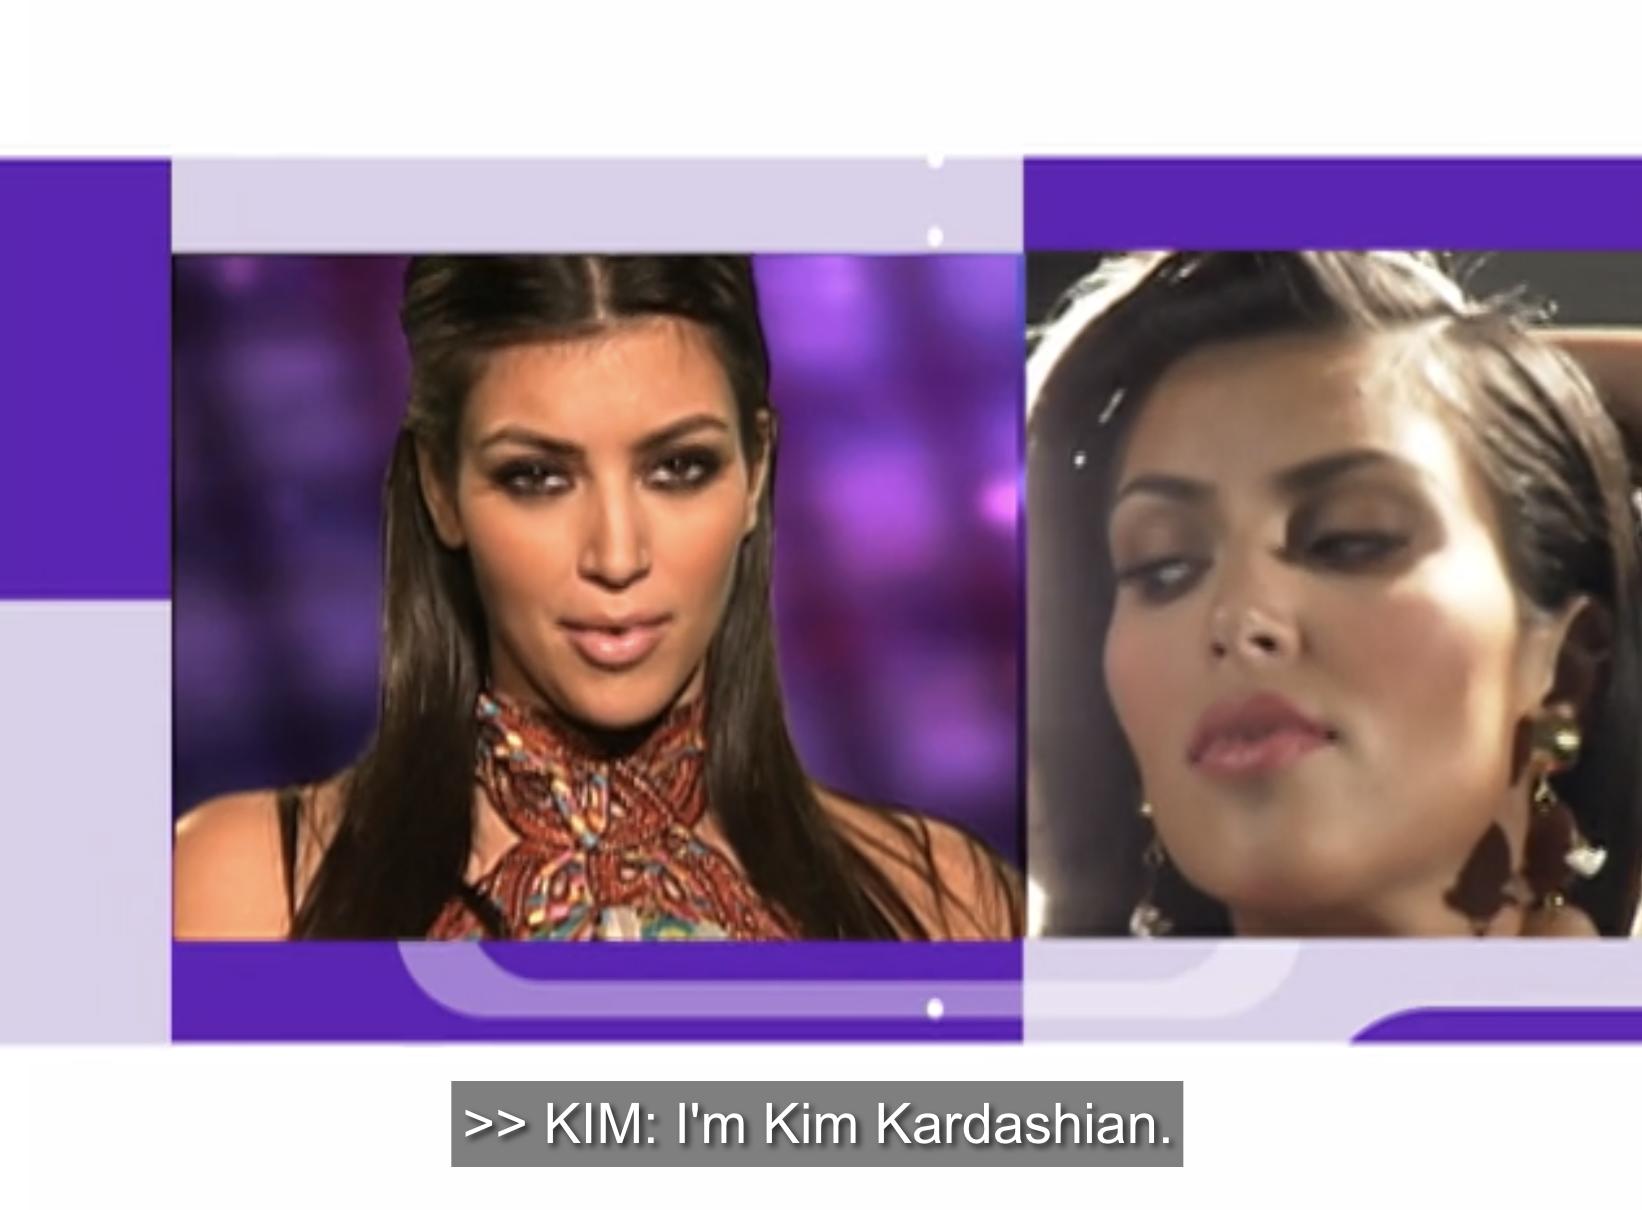 """I'm Kim Kardashian."""